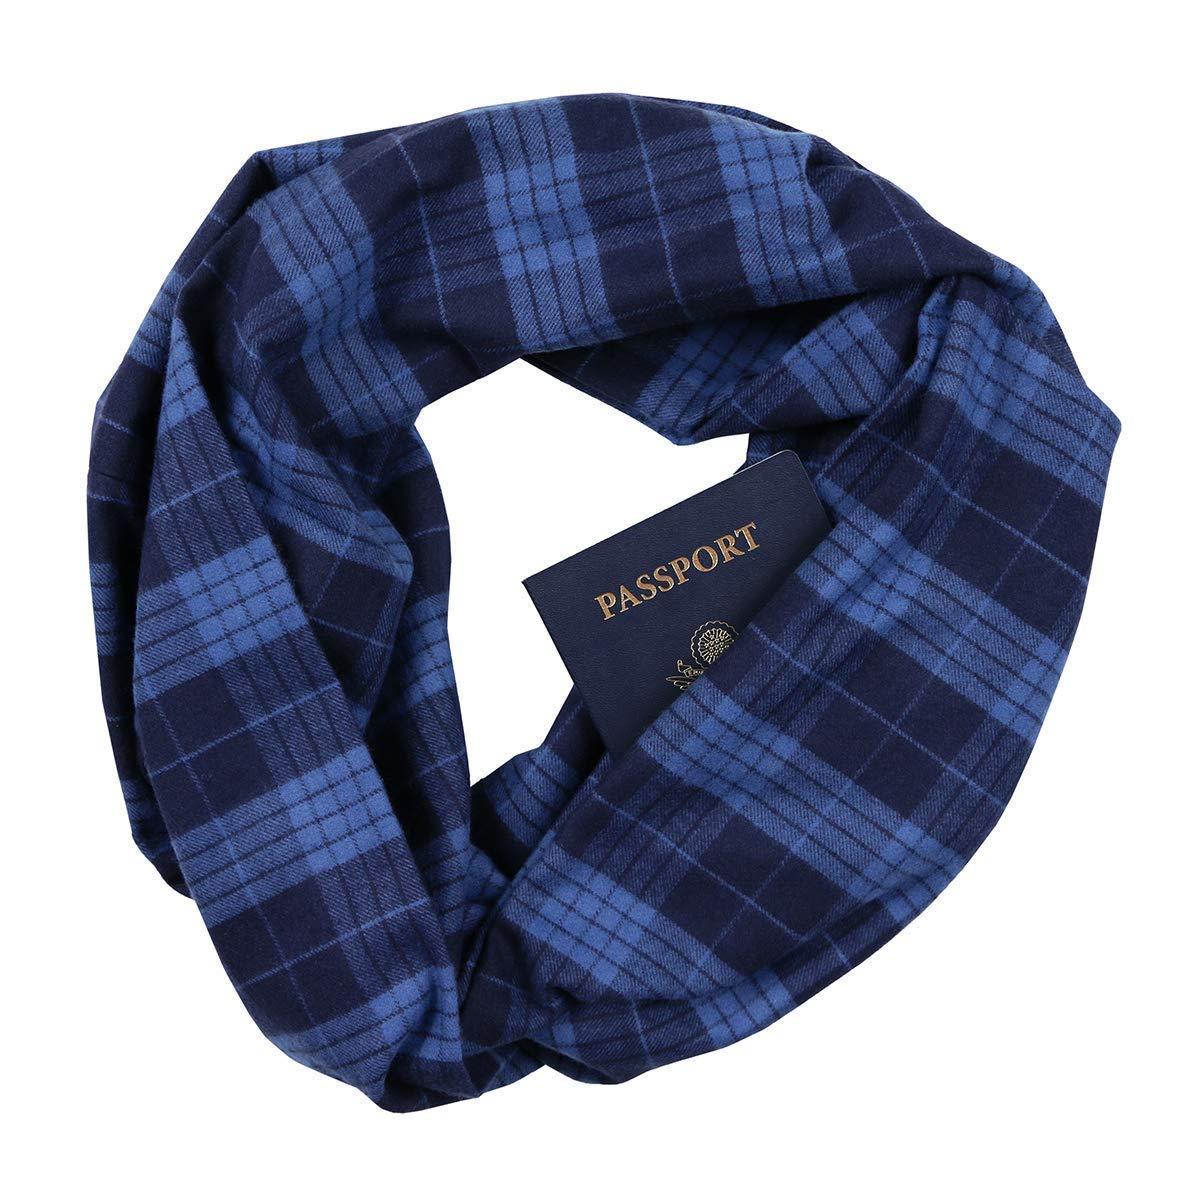 Blue Plaid Infinity Scarf with Zippered Secret Pocket